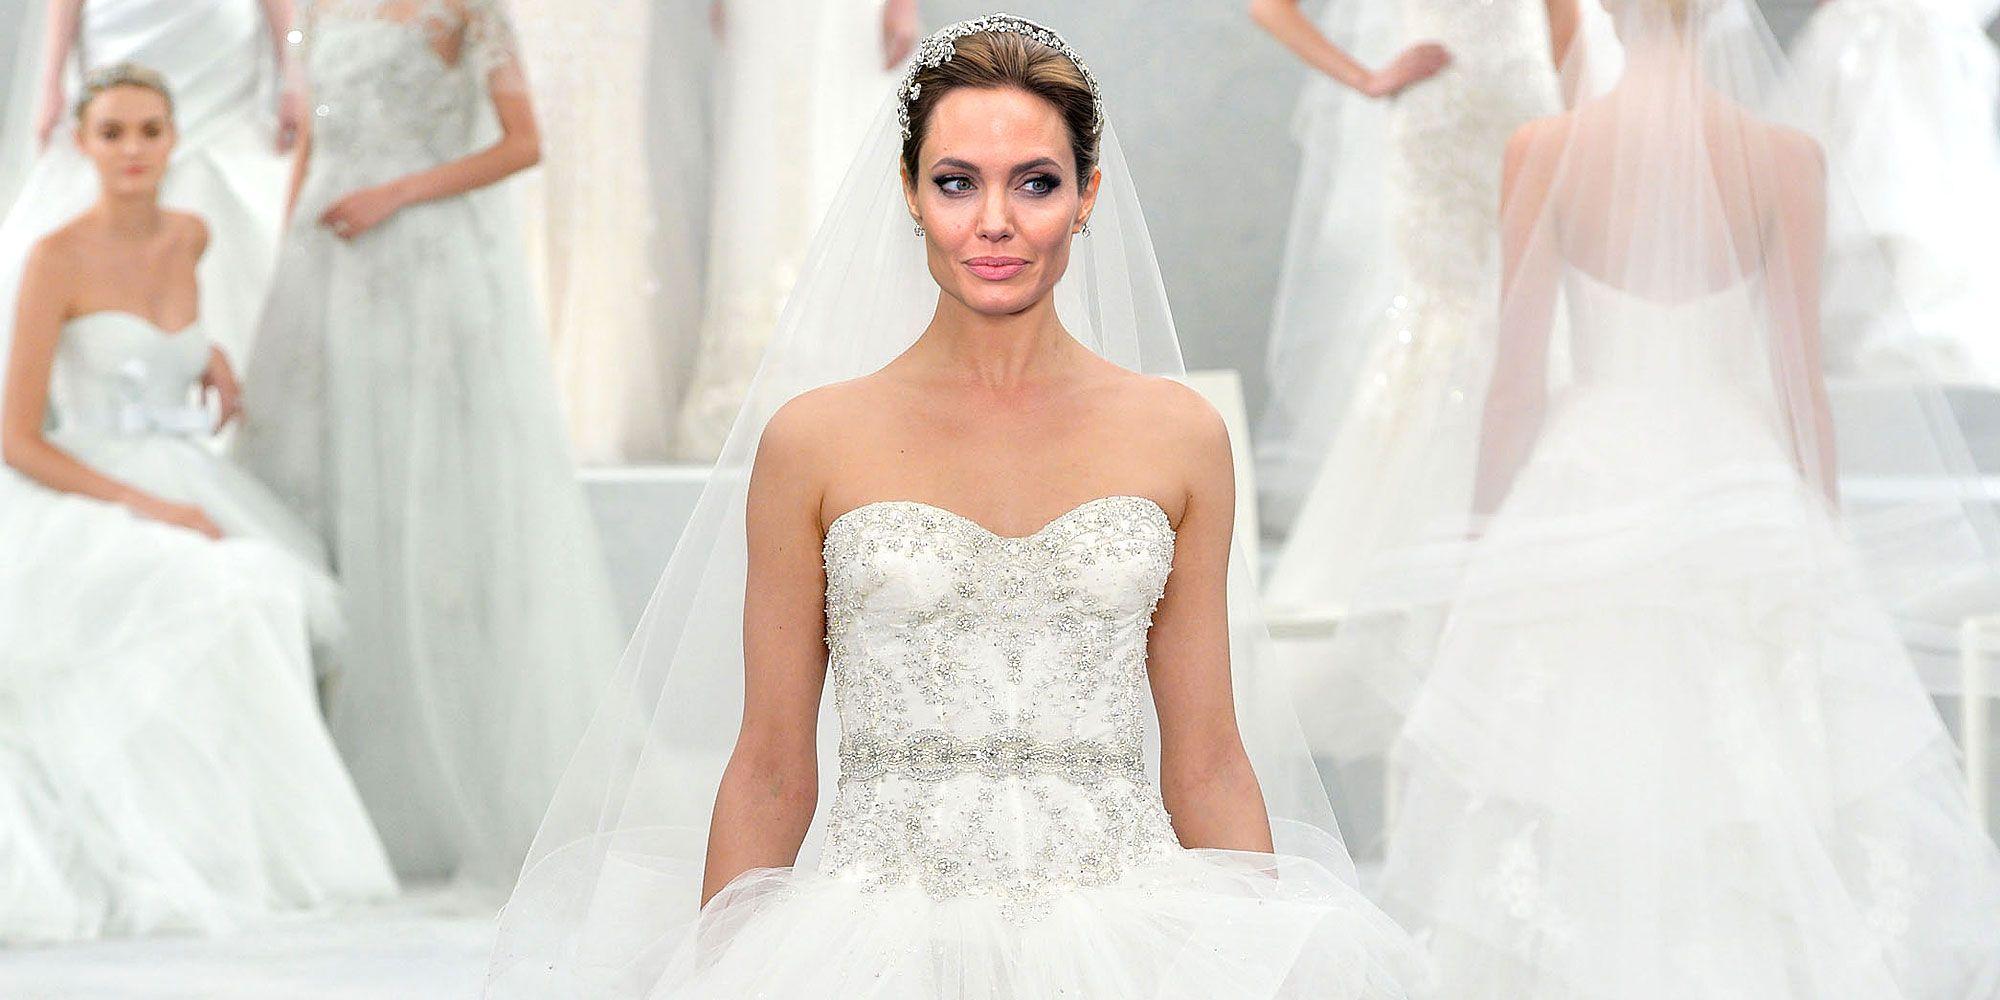 angelina jolie wedding dress | Wedding